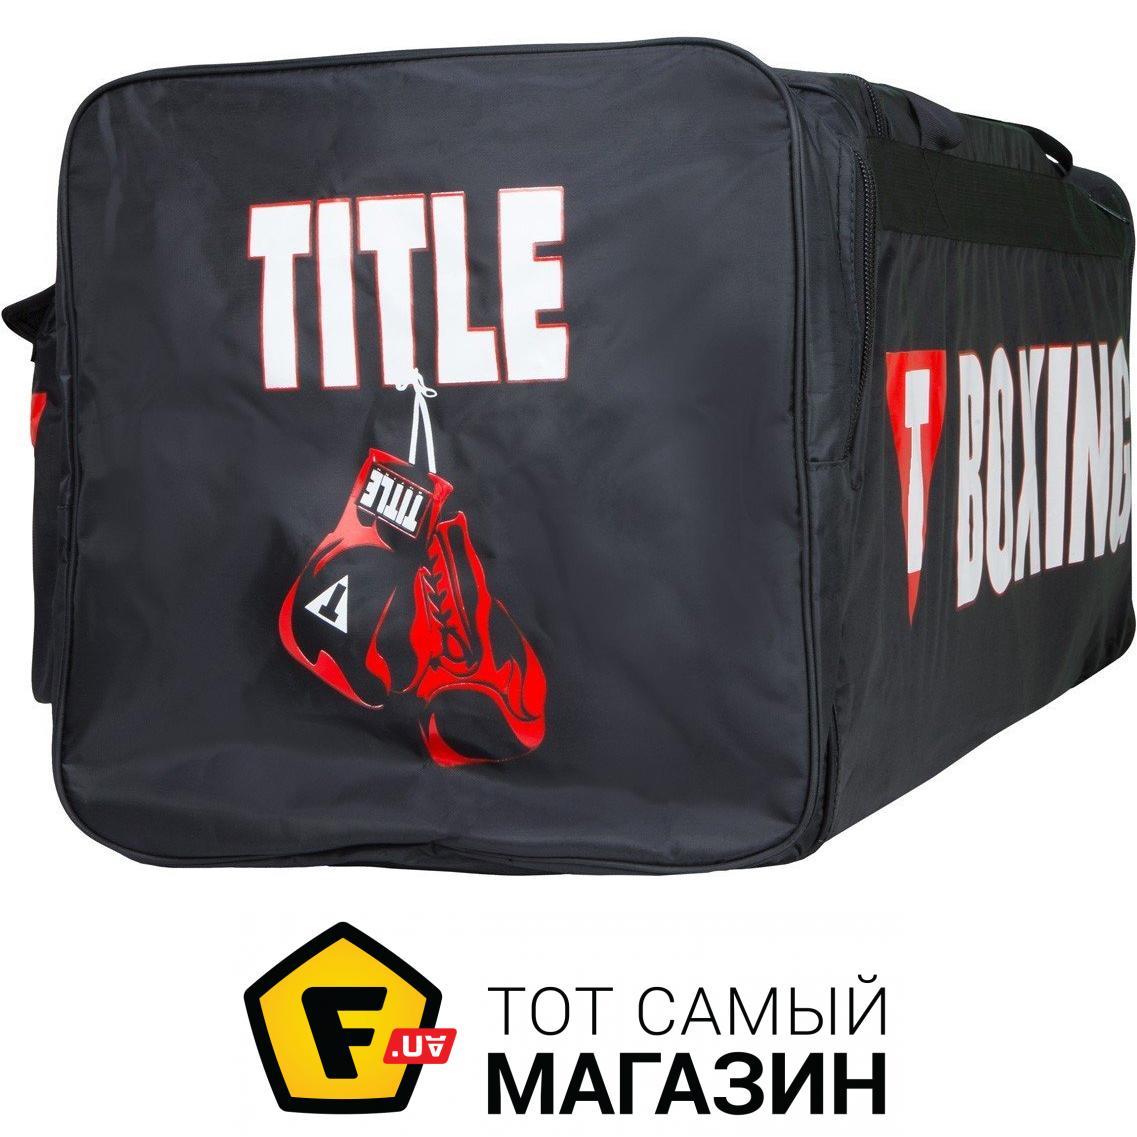 29e47b78a801 Title Boxing Super Heavyweight Team Equipment Bag черный (TBAG21) Ширина:  96 см,